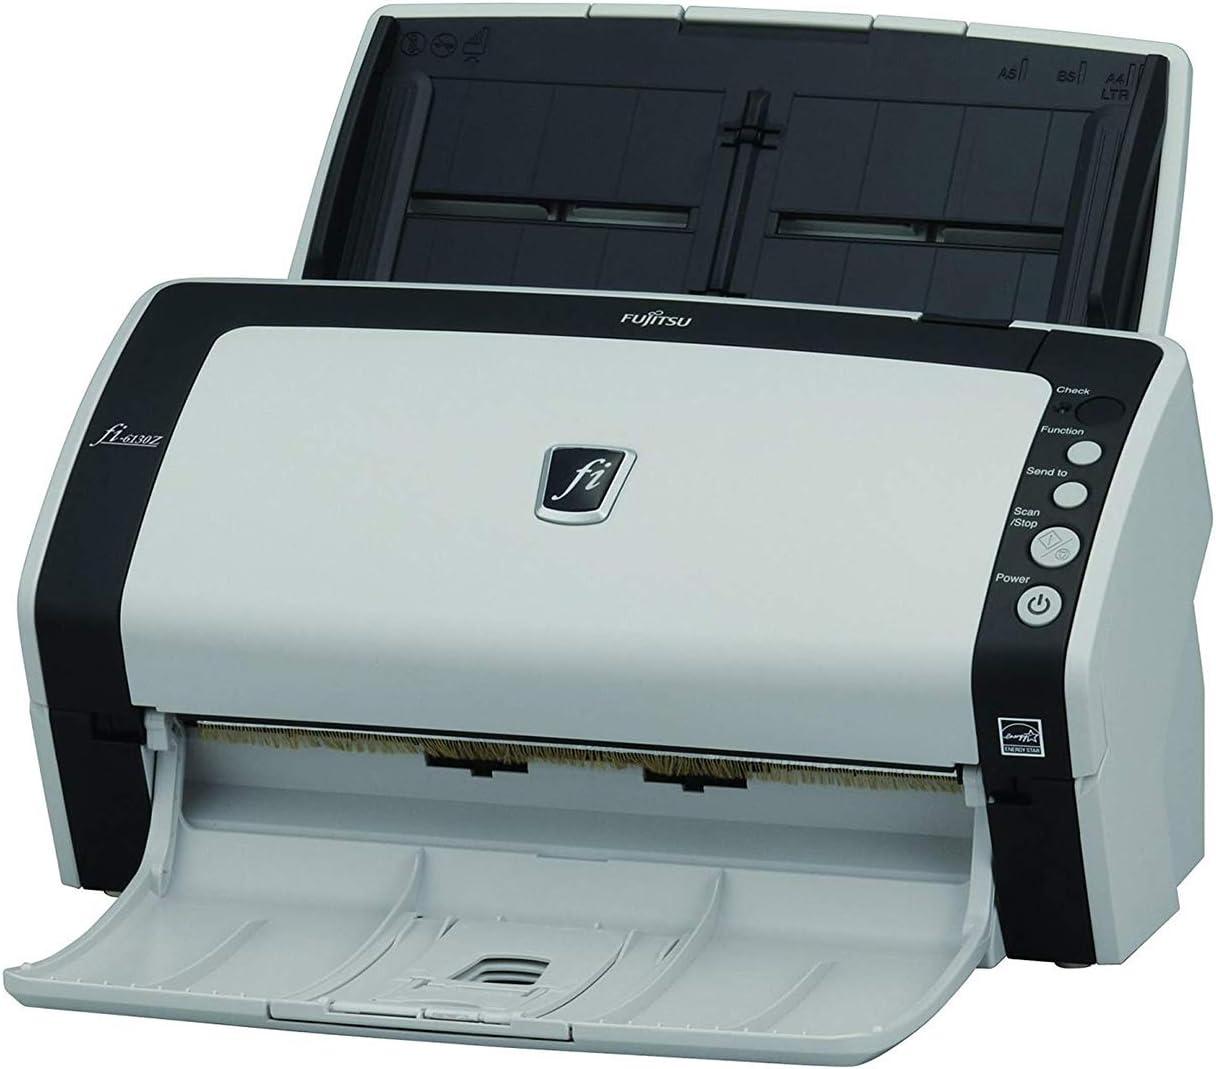 2LL6034 Fujitsu fi-6130Z Sheetfed Scanner